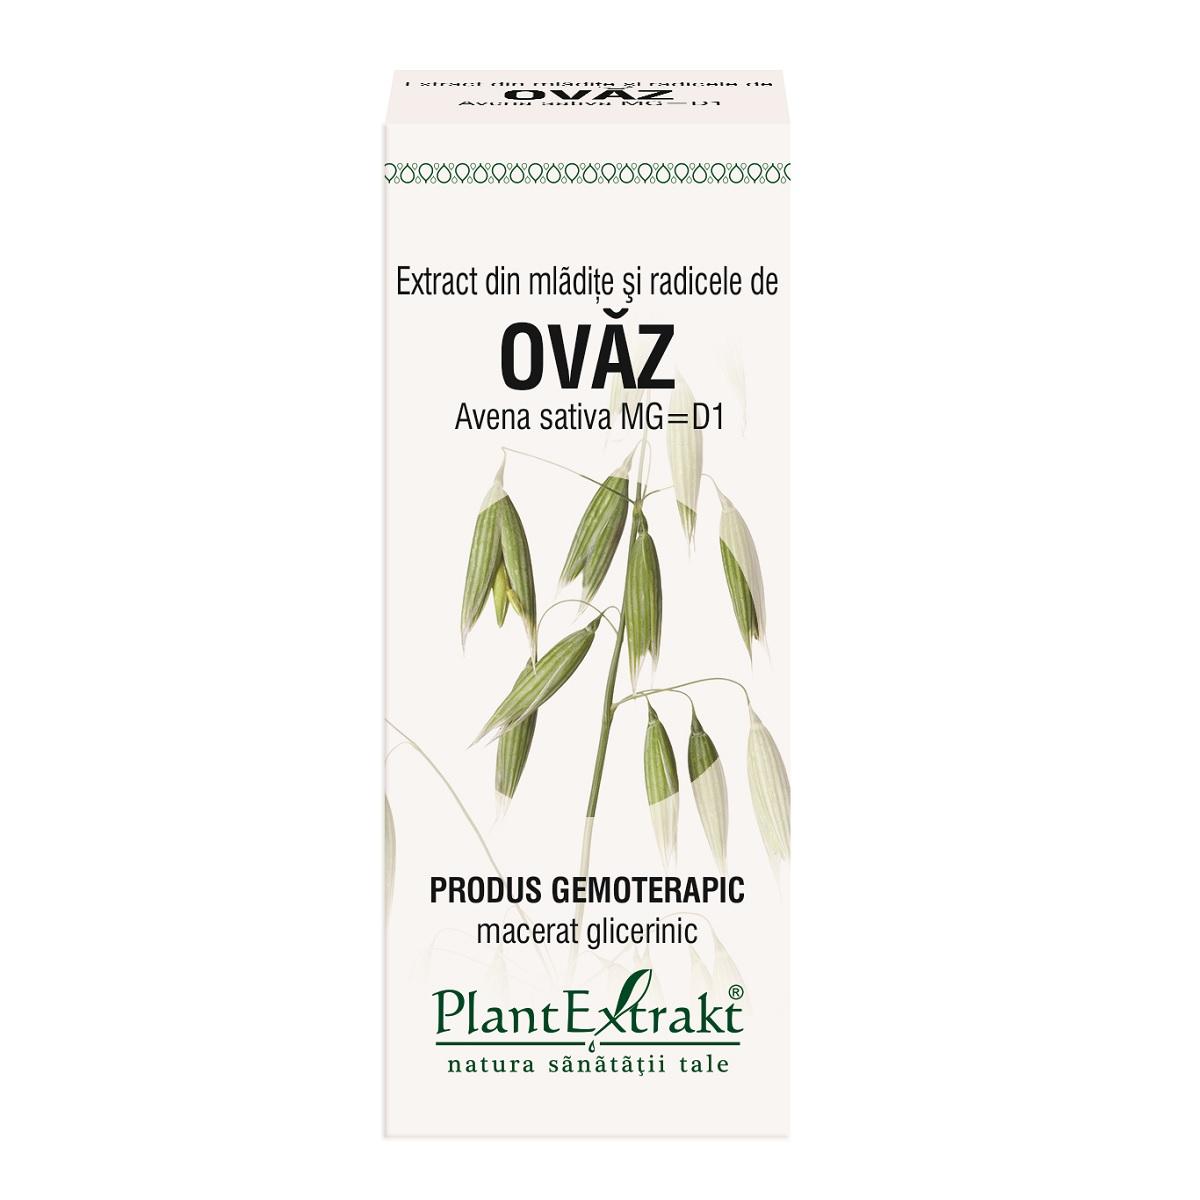 Extract din mladite si radicele de ovaz, 50ml, Plantextrakt drmax.ro